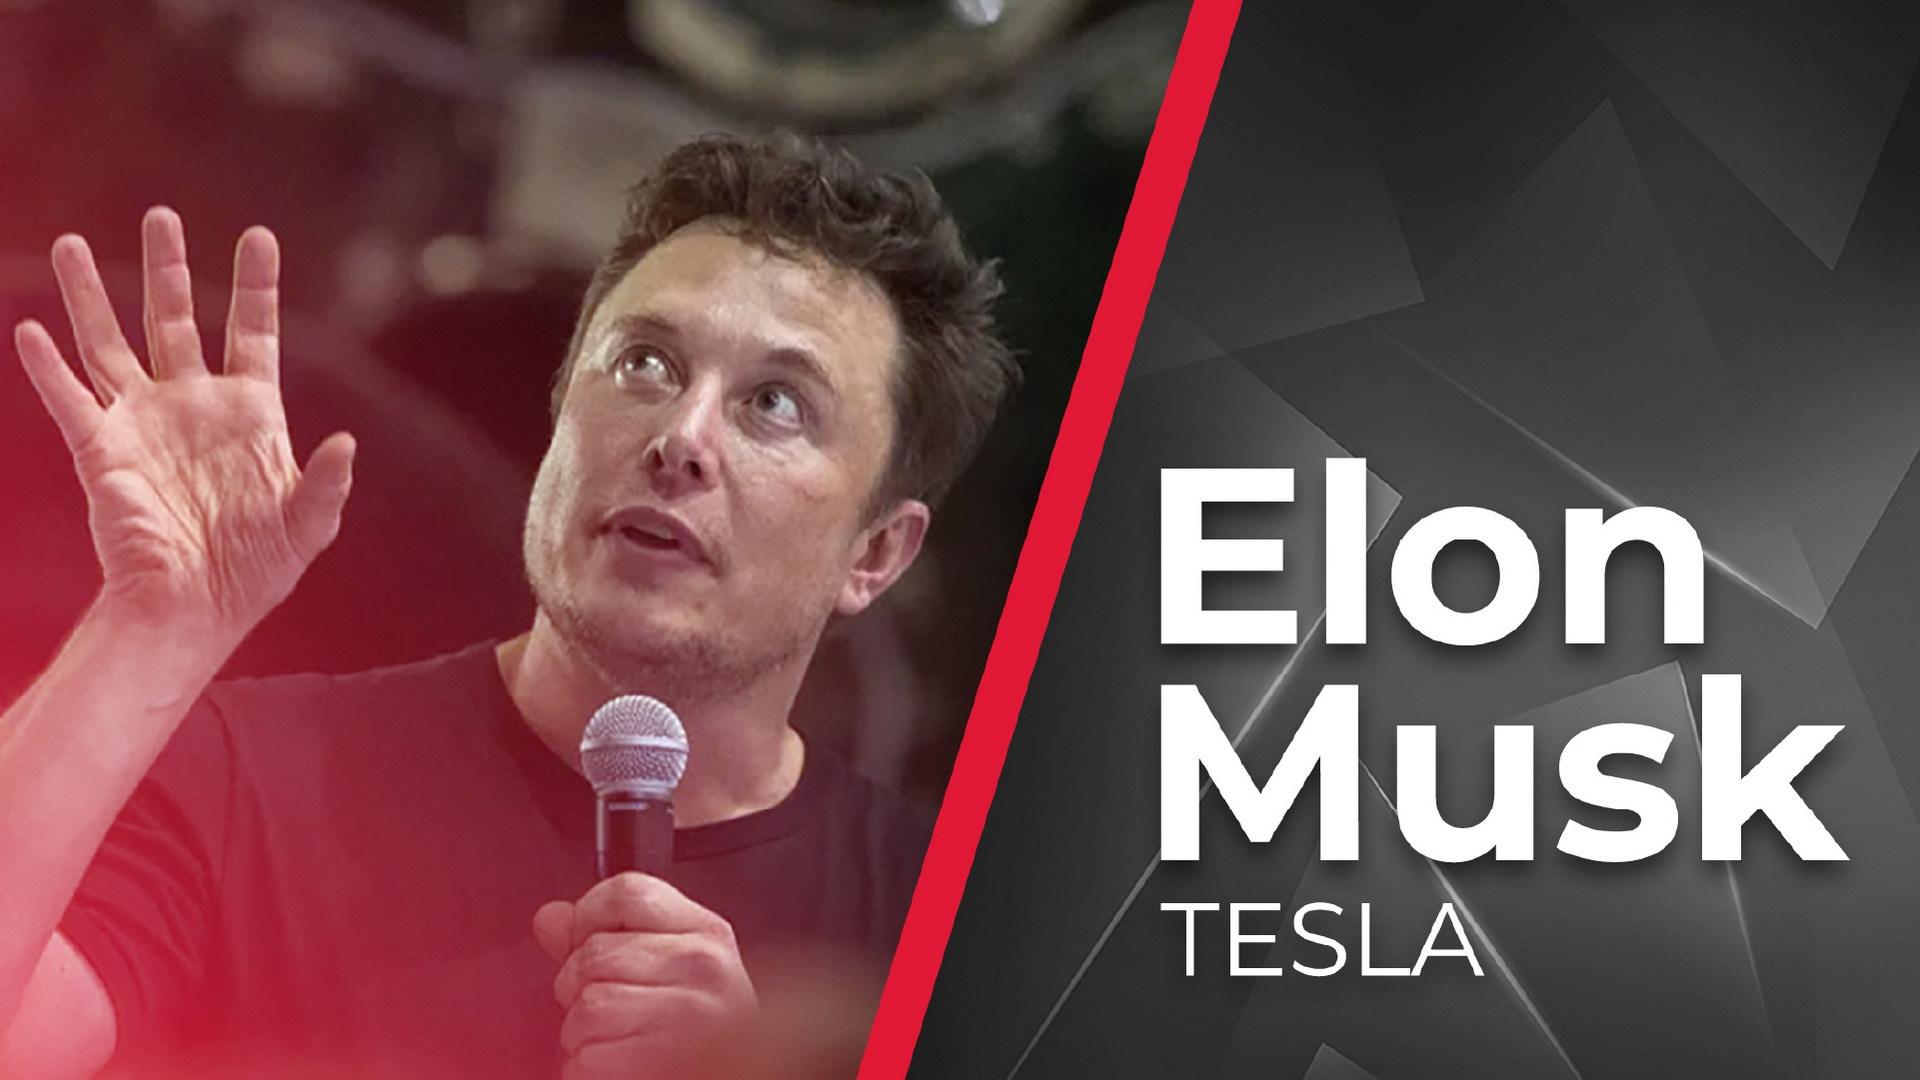 tesla, Elon Musk, Tesla Motors, Musk